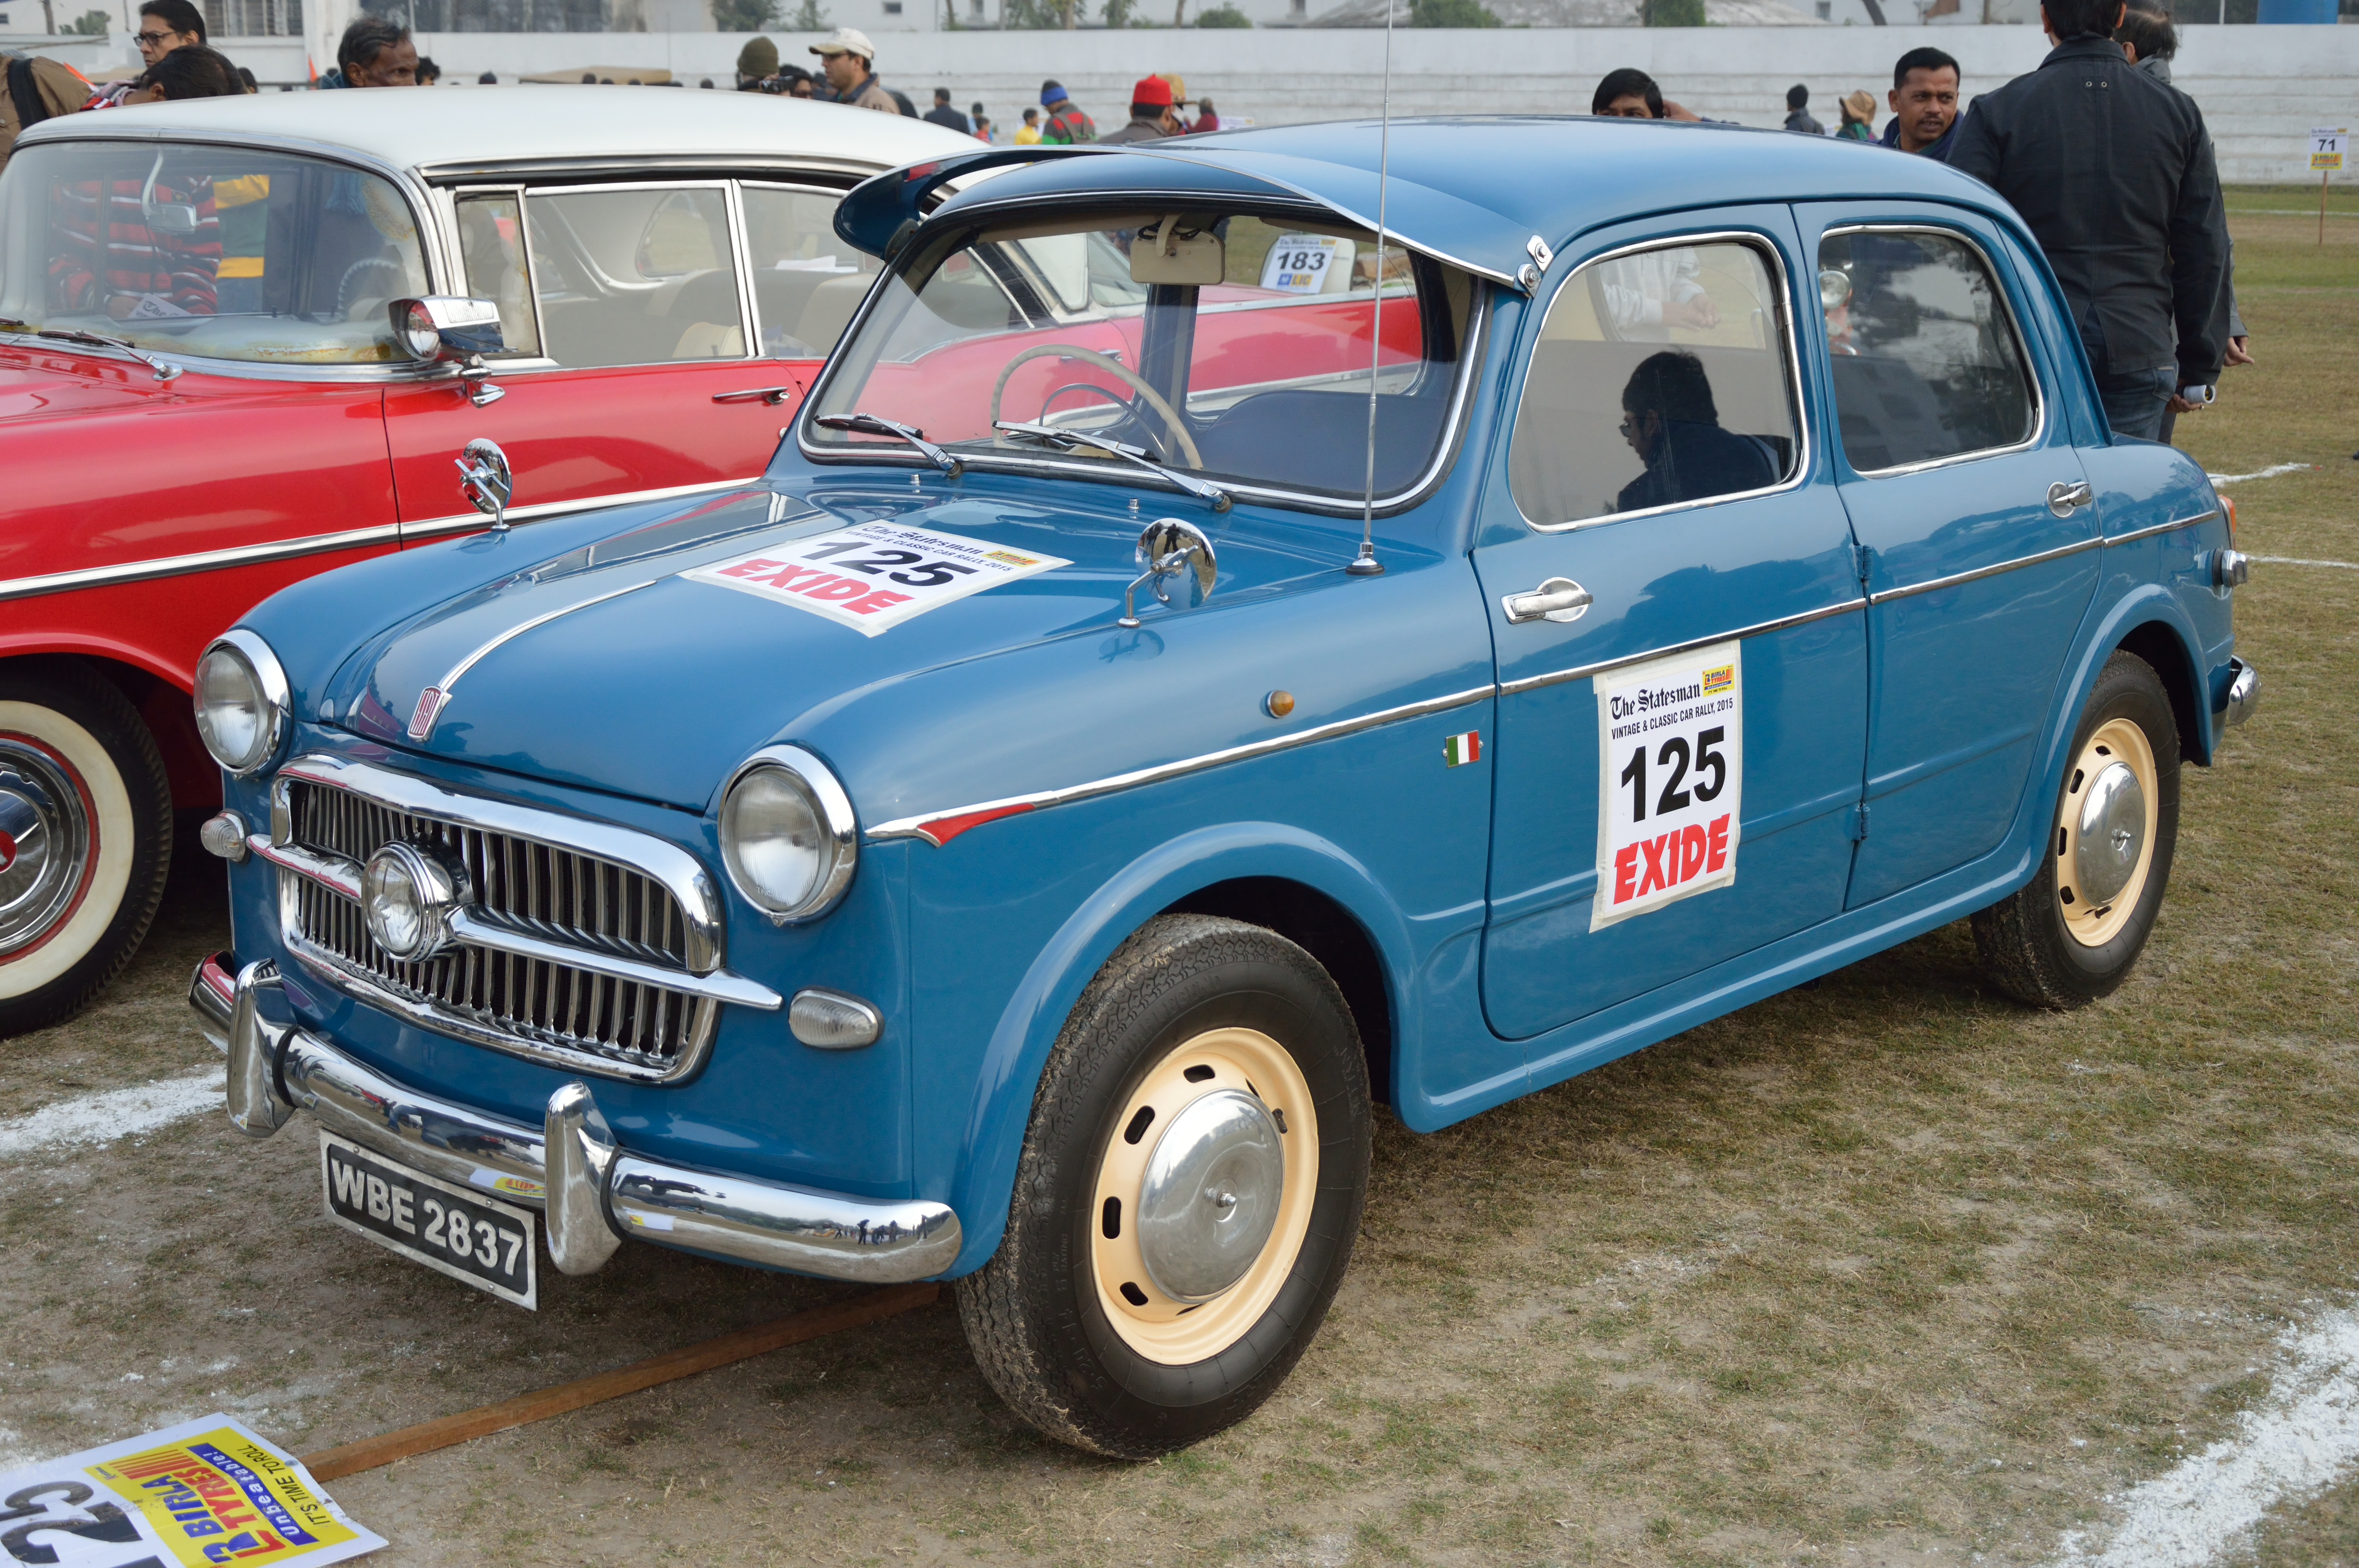 Fiat Of Cc >> File Fiat Elegant 1957 1100 Cc 4 Cyl Wbe 2837 Kolkata